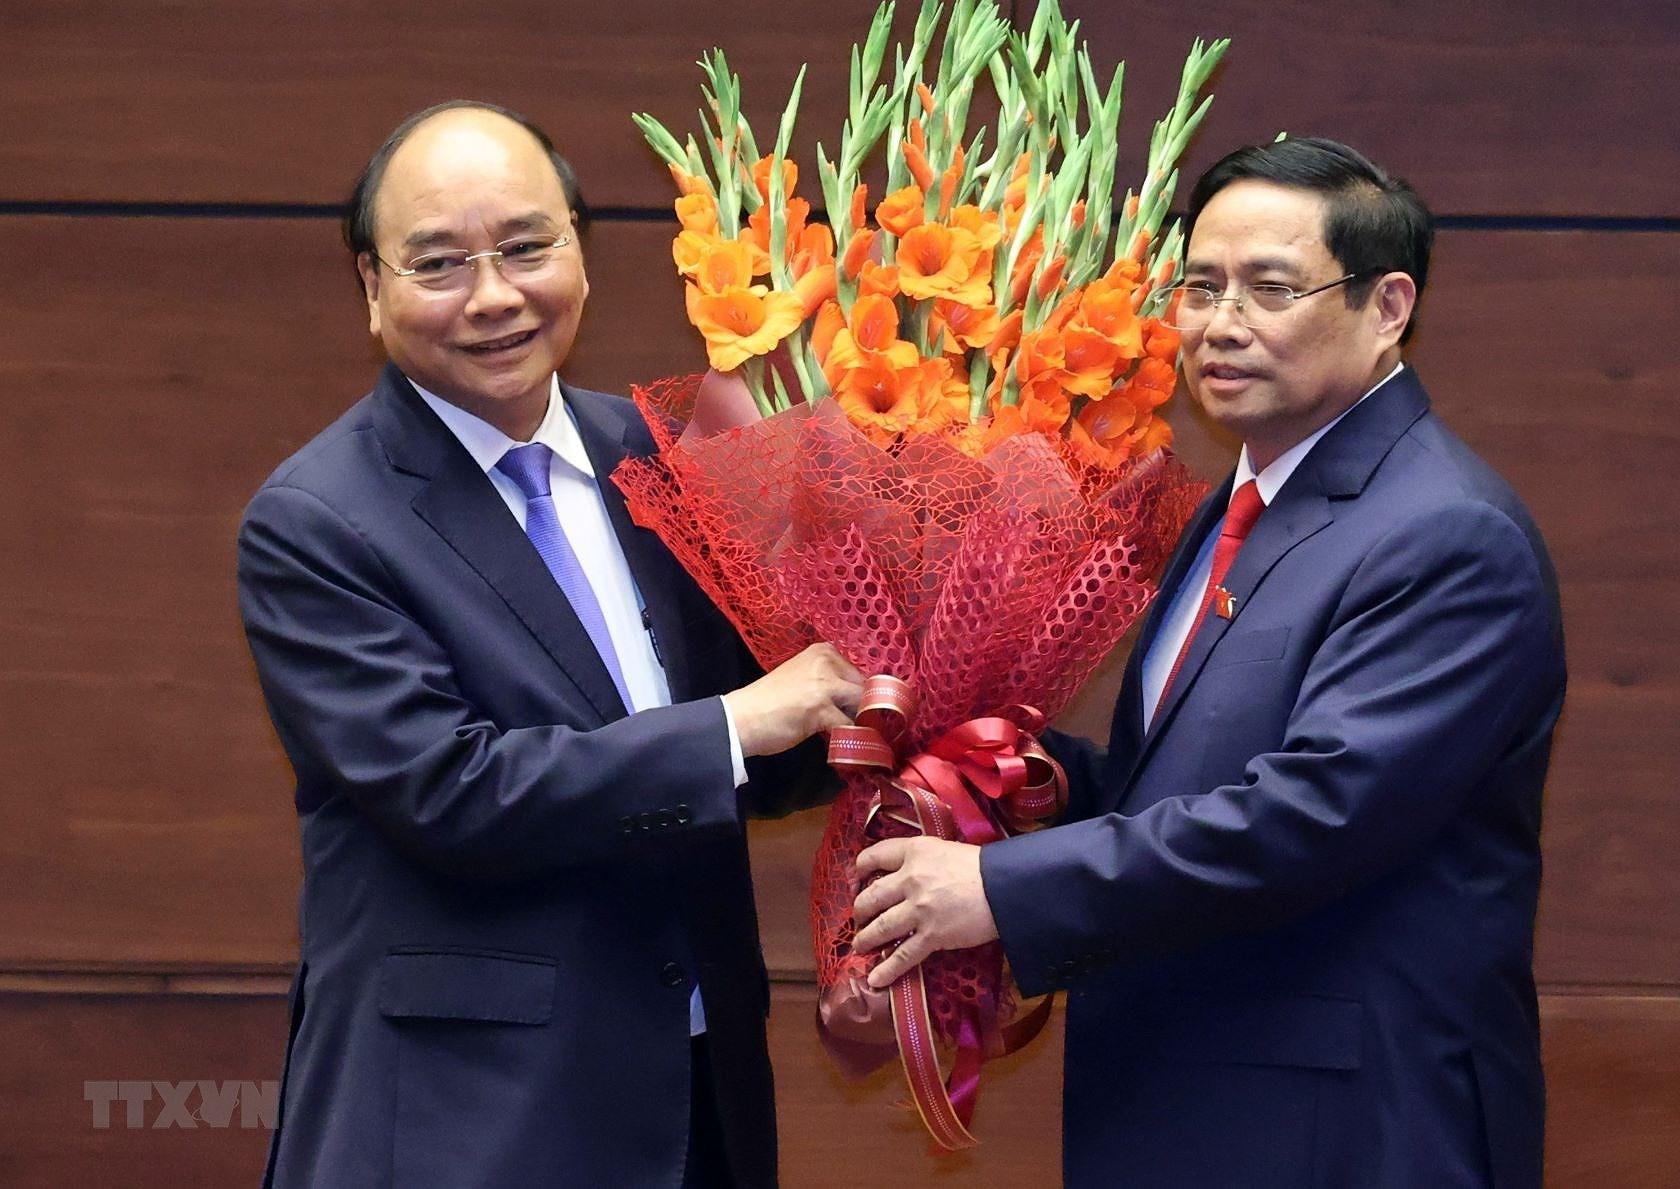 Truyen thong Singapore danh gia cao doi ngu lanh dao moi cua Viet Nam hinh anh 1